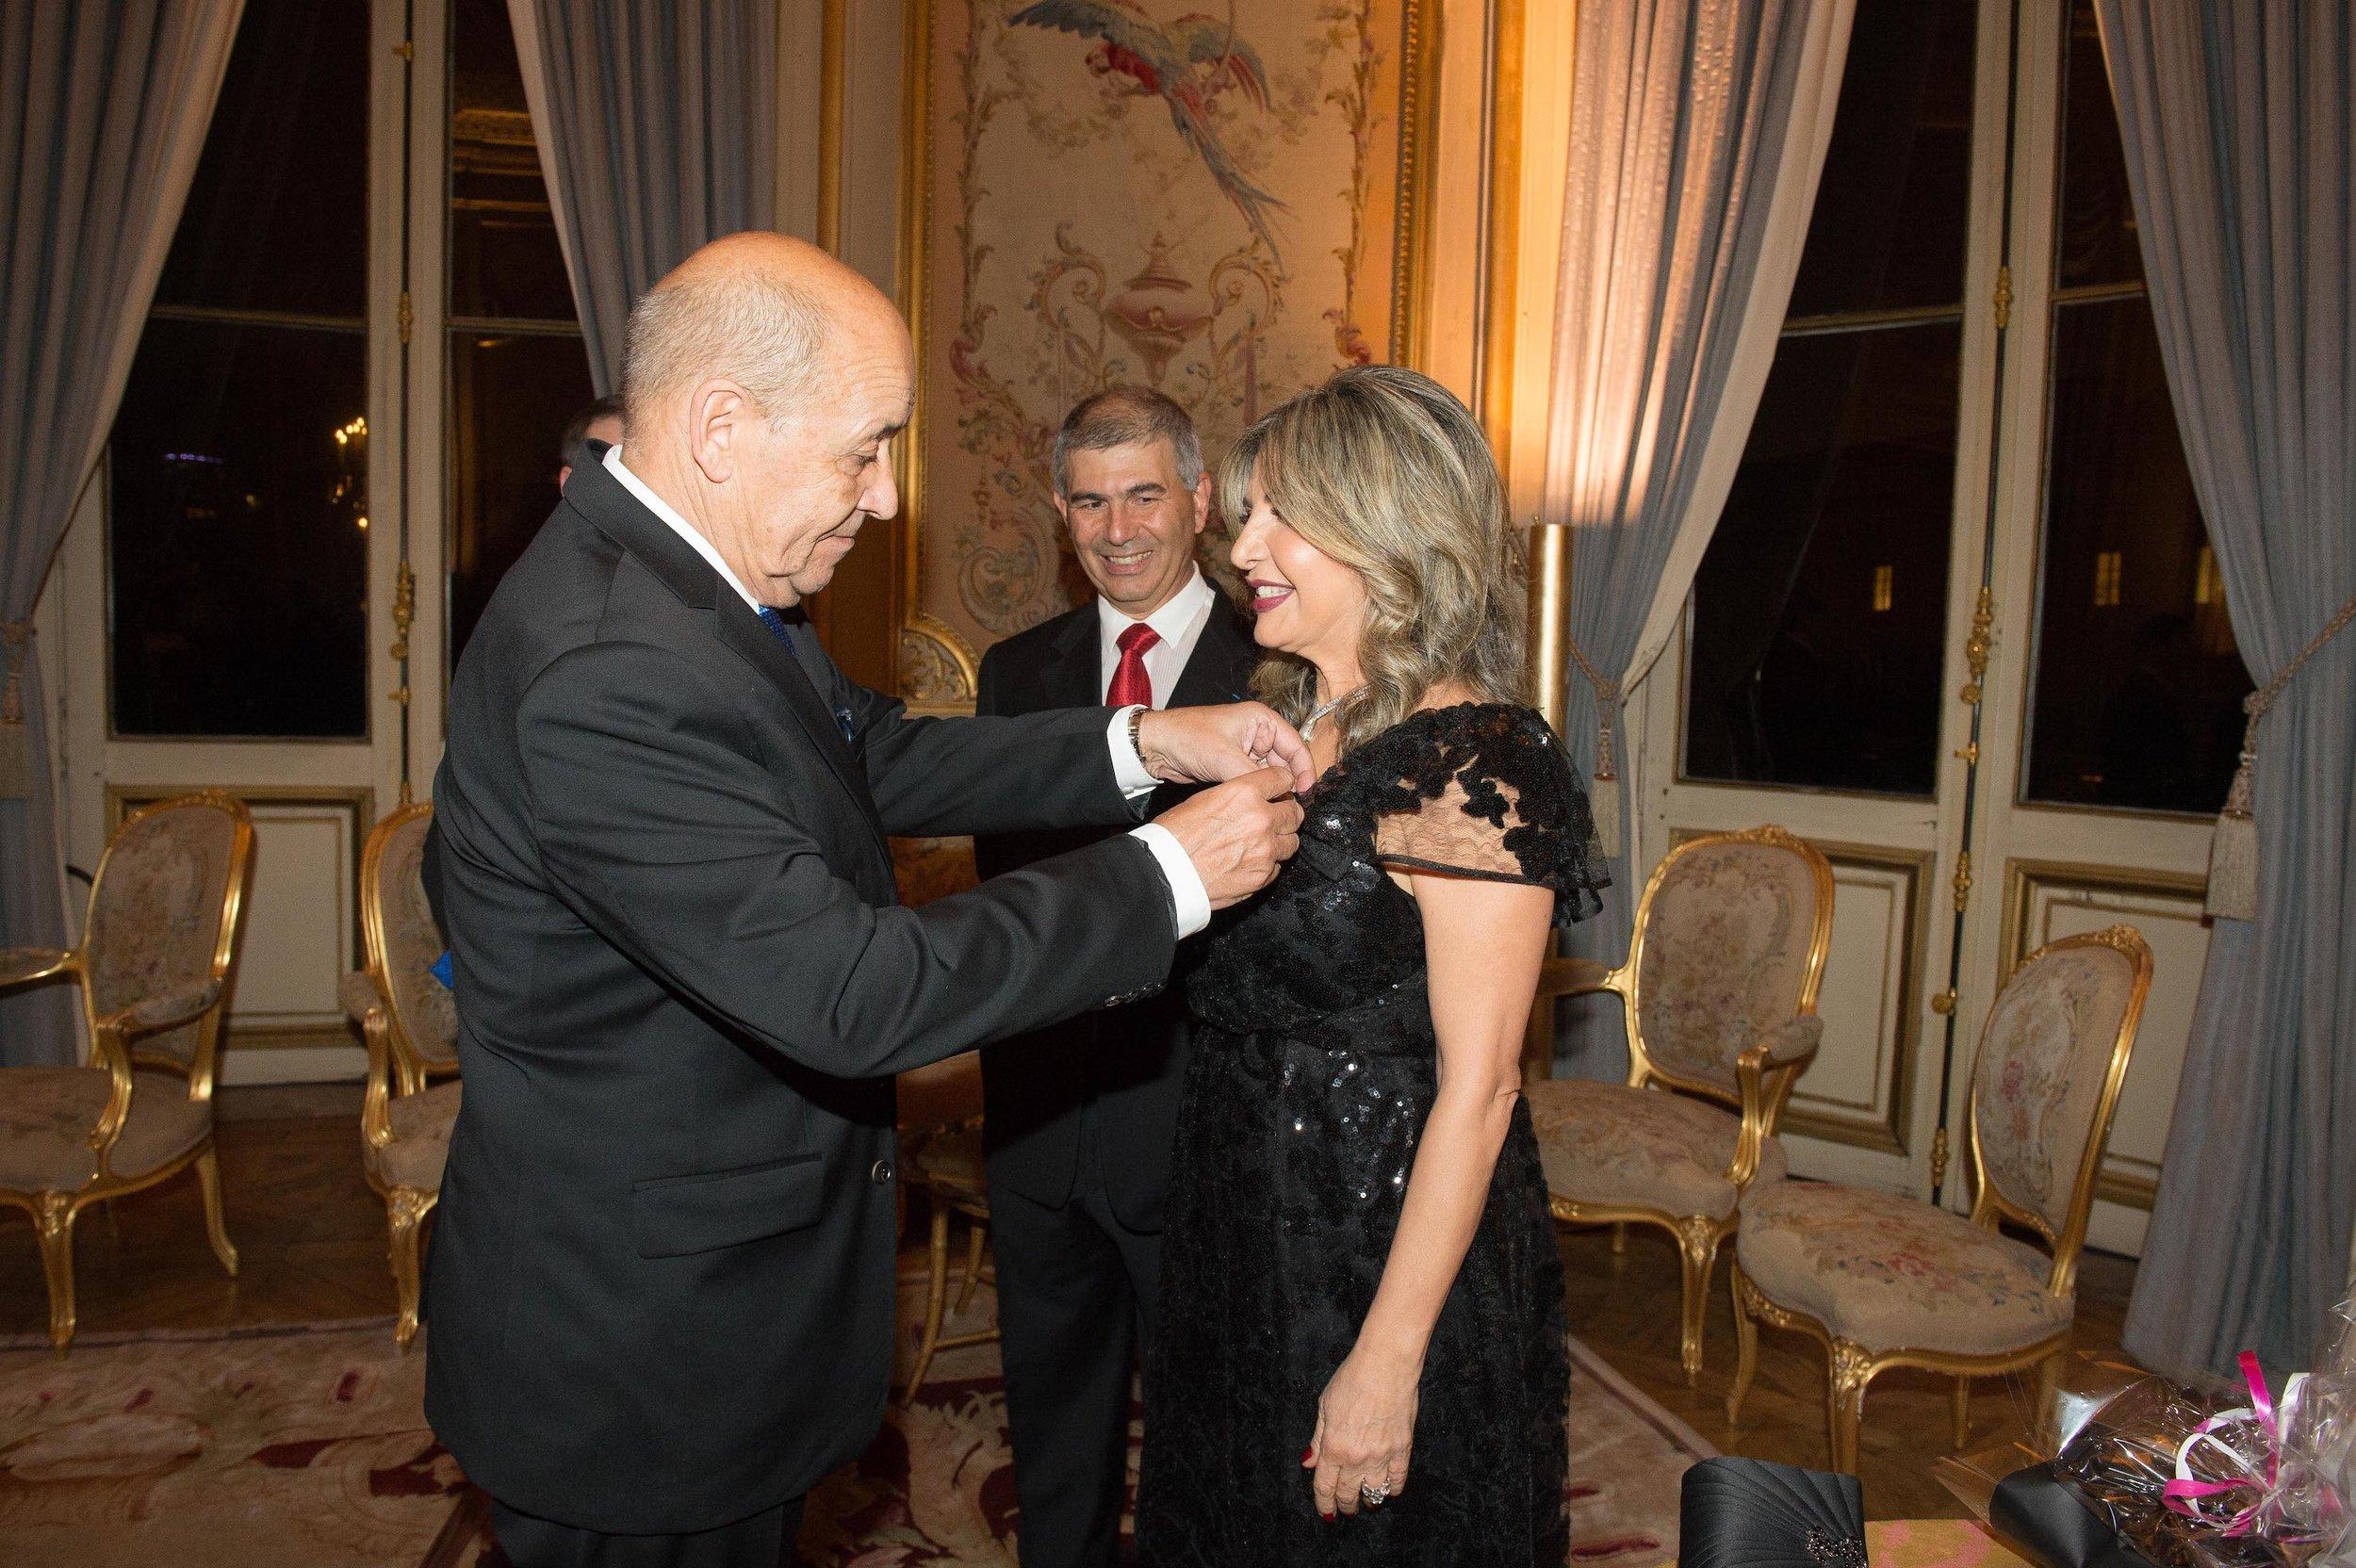 INGIE Paris and her husband Patrick Chalhoub.jpg